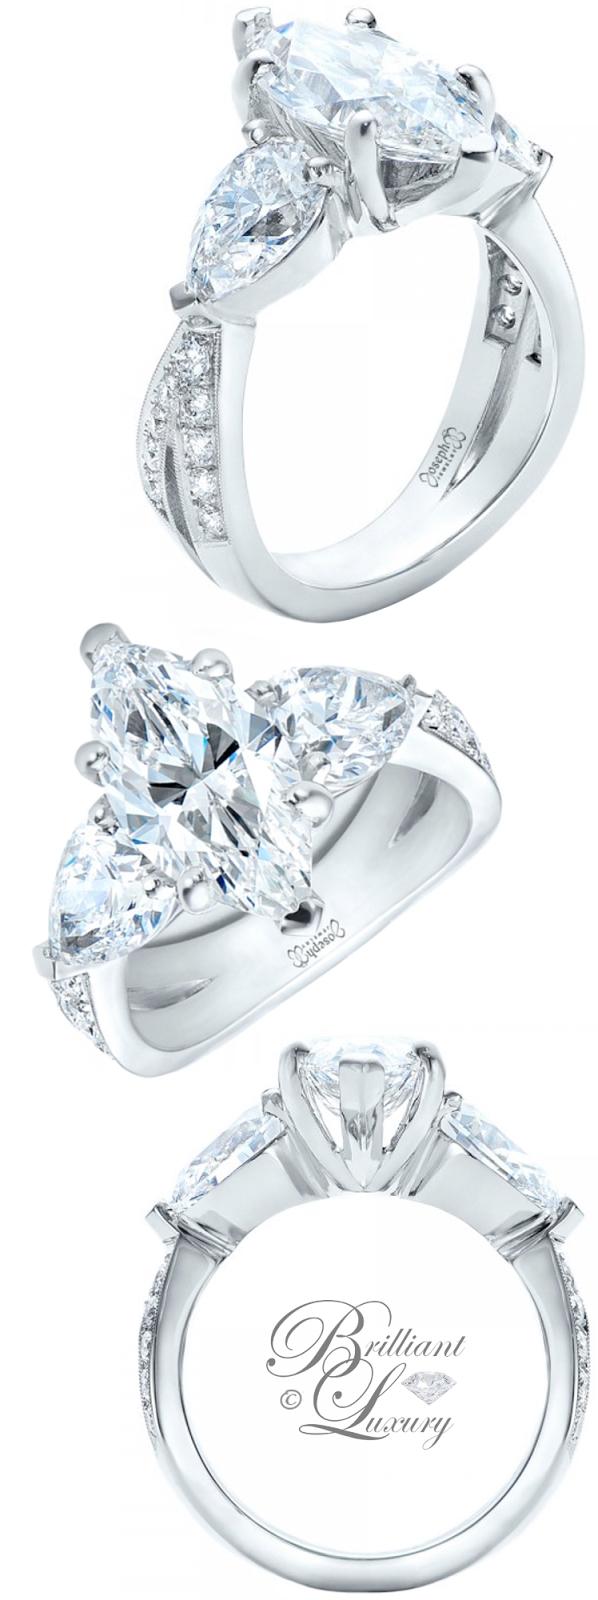 Brilliant Luxury ♦ Joseph Jewelry Custom Marquise Diamond Engagement Ring